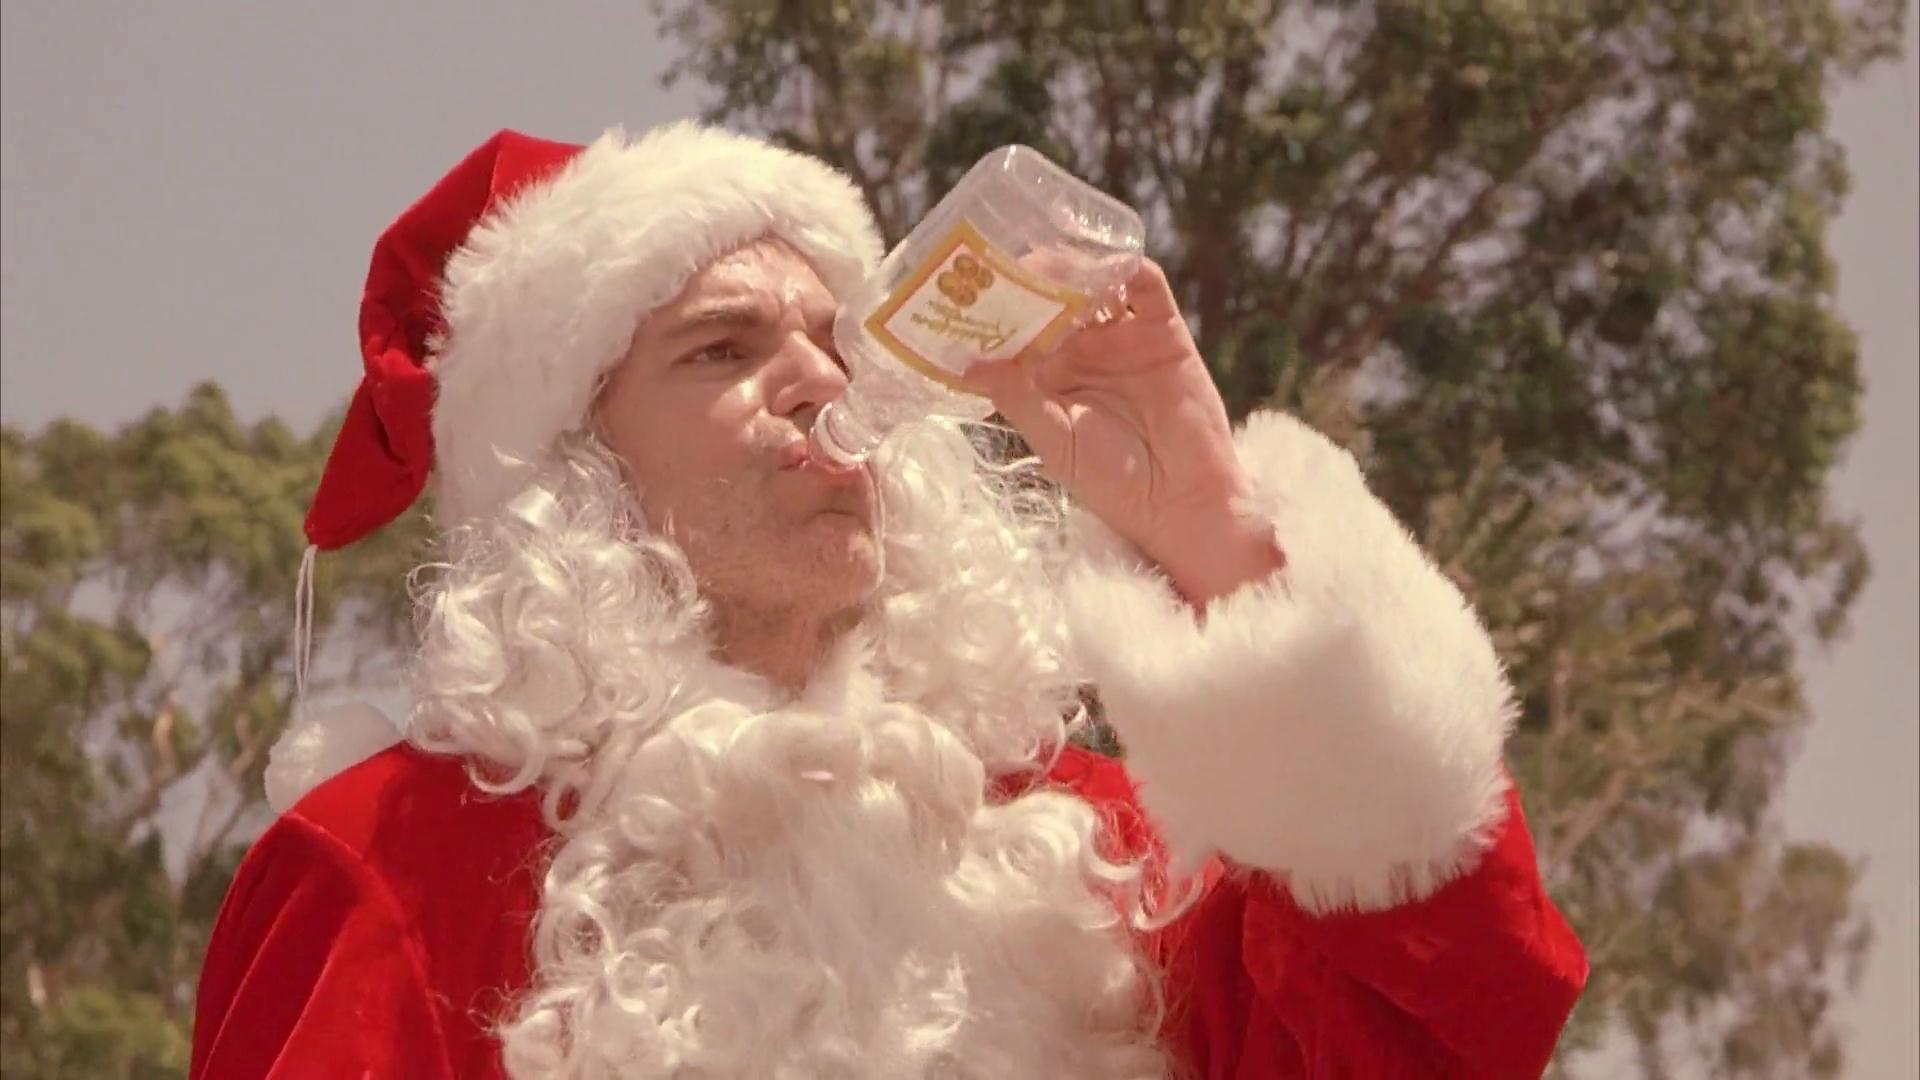 Bad Santa - Adult World